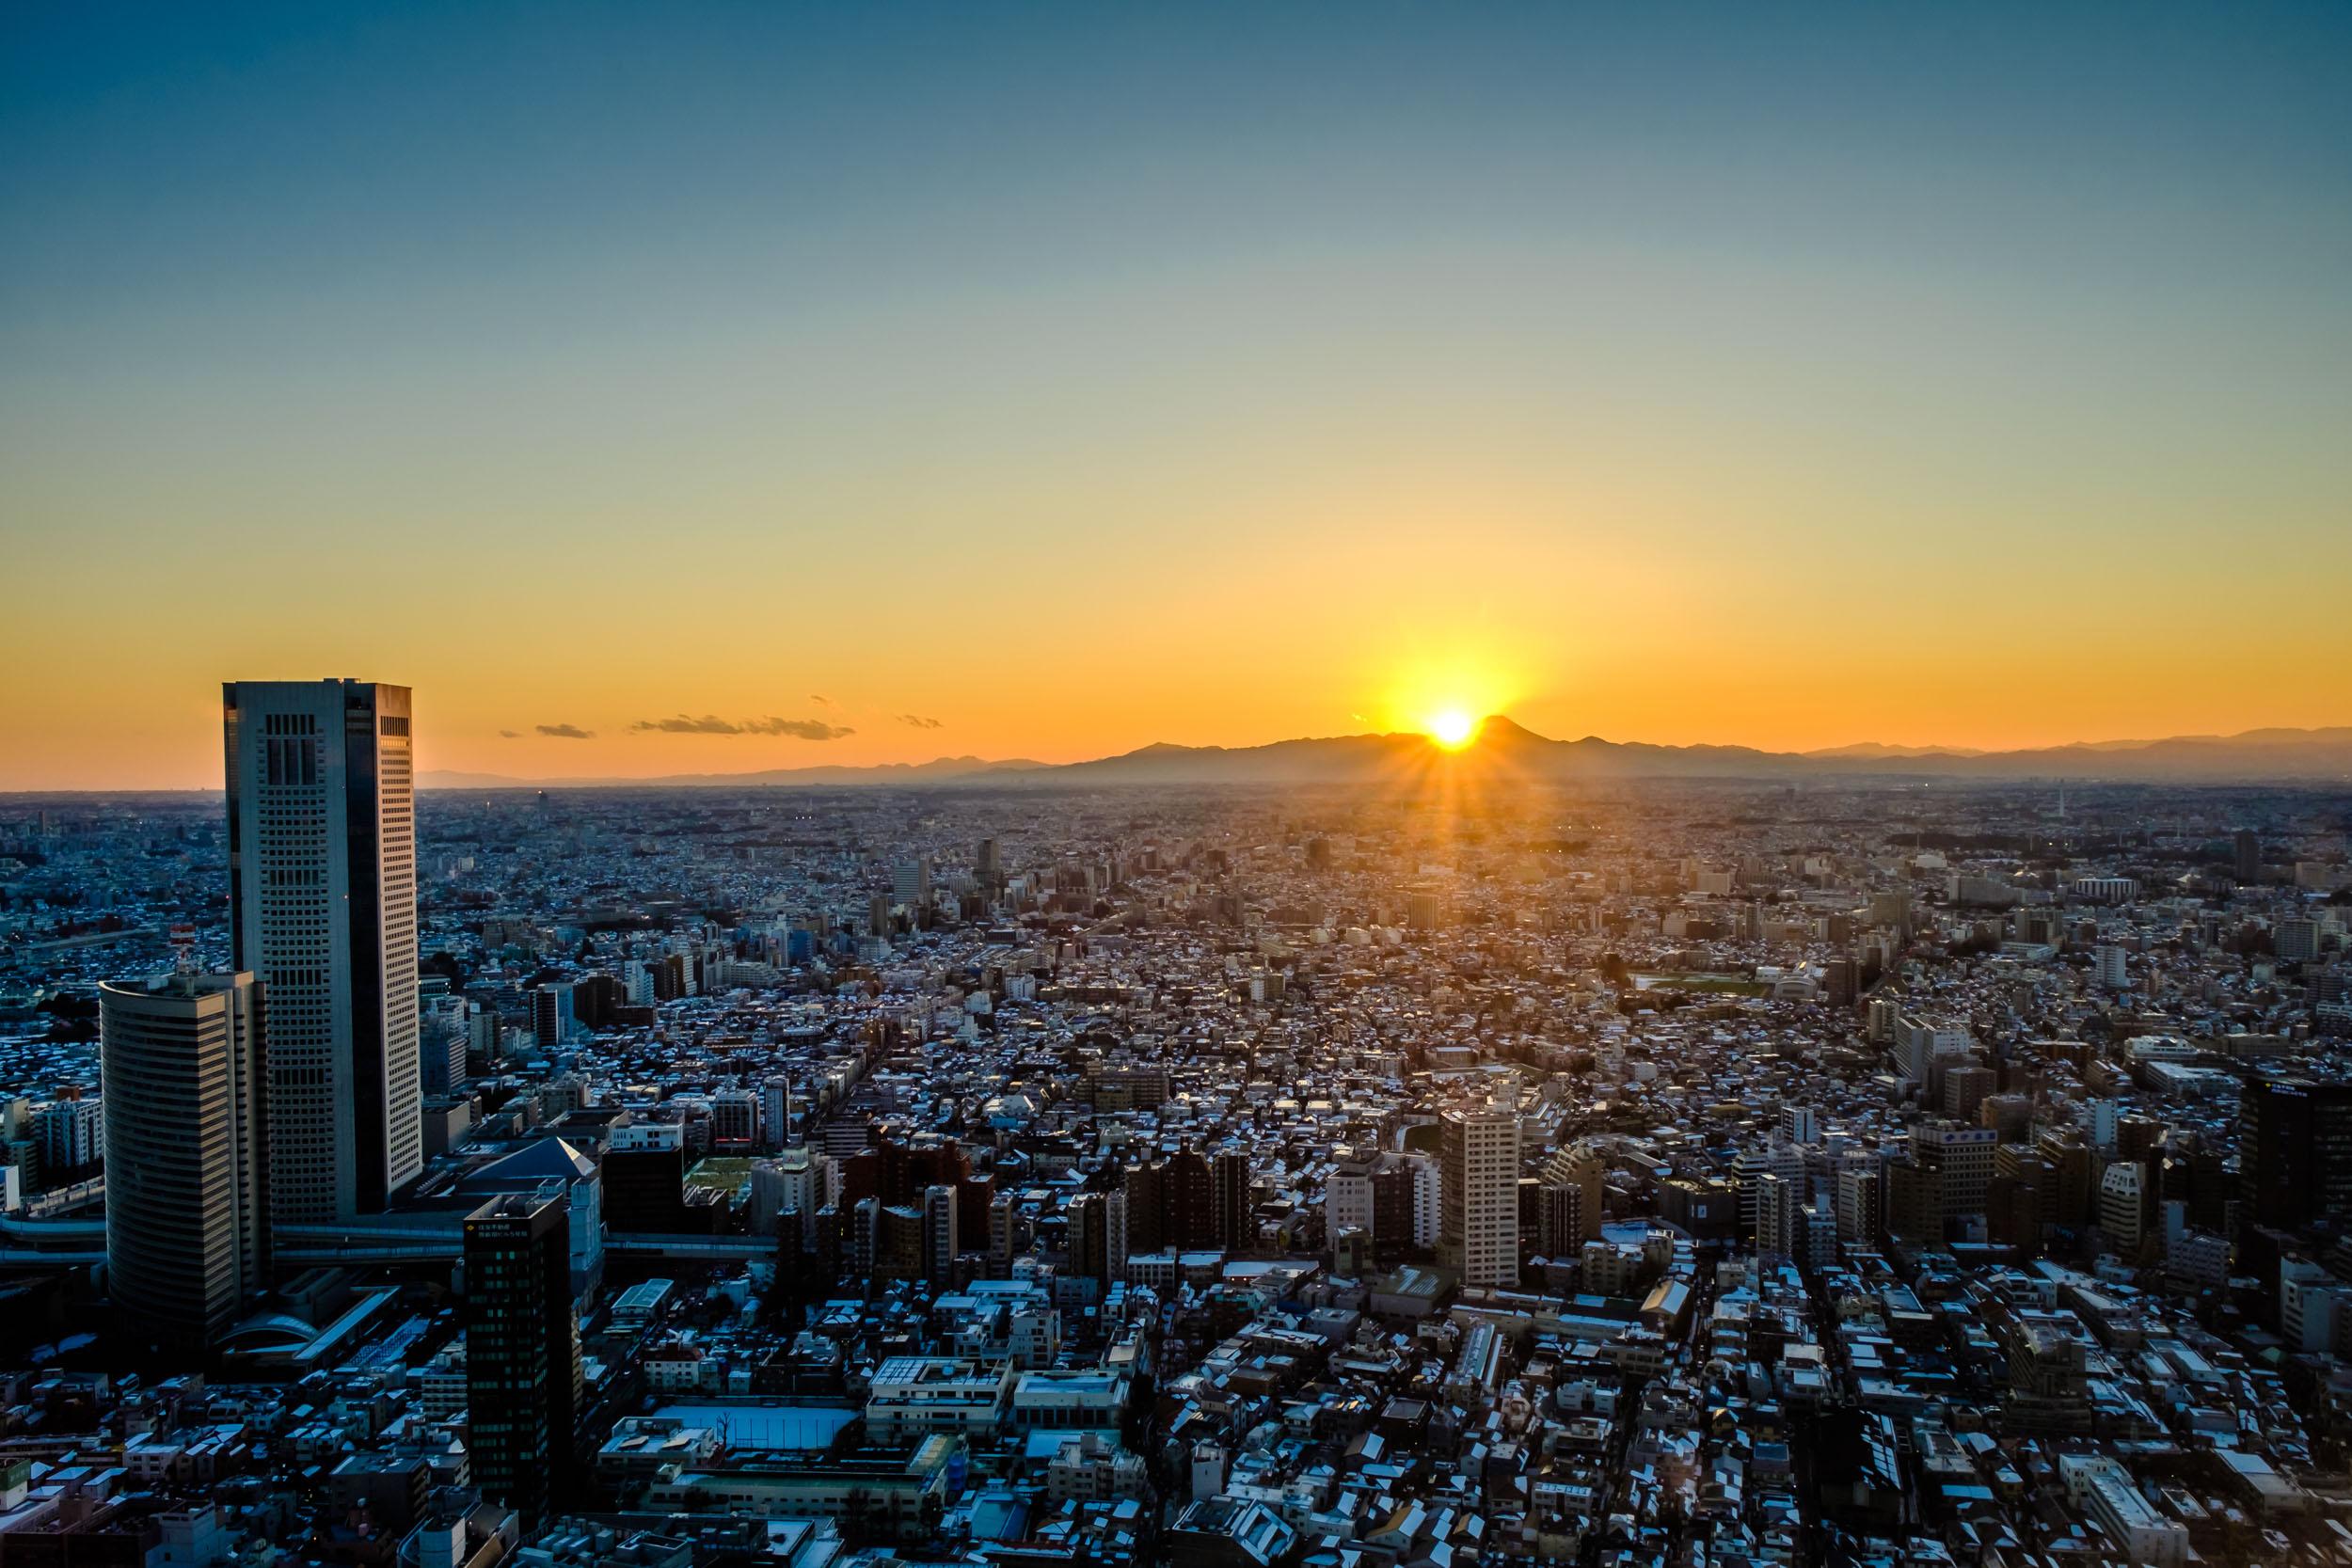 A Mount Fuji sunset